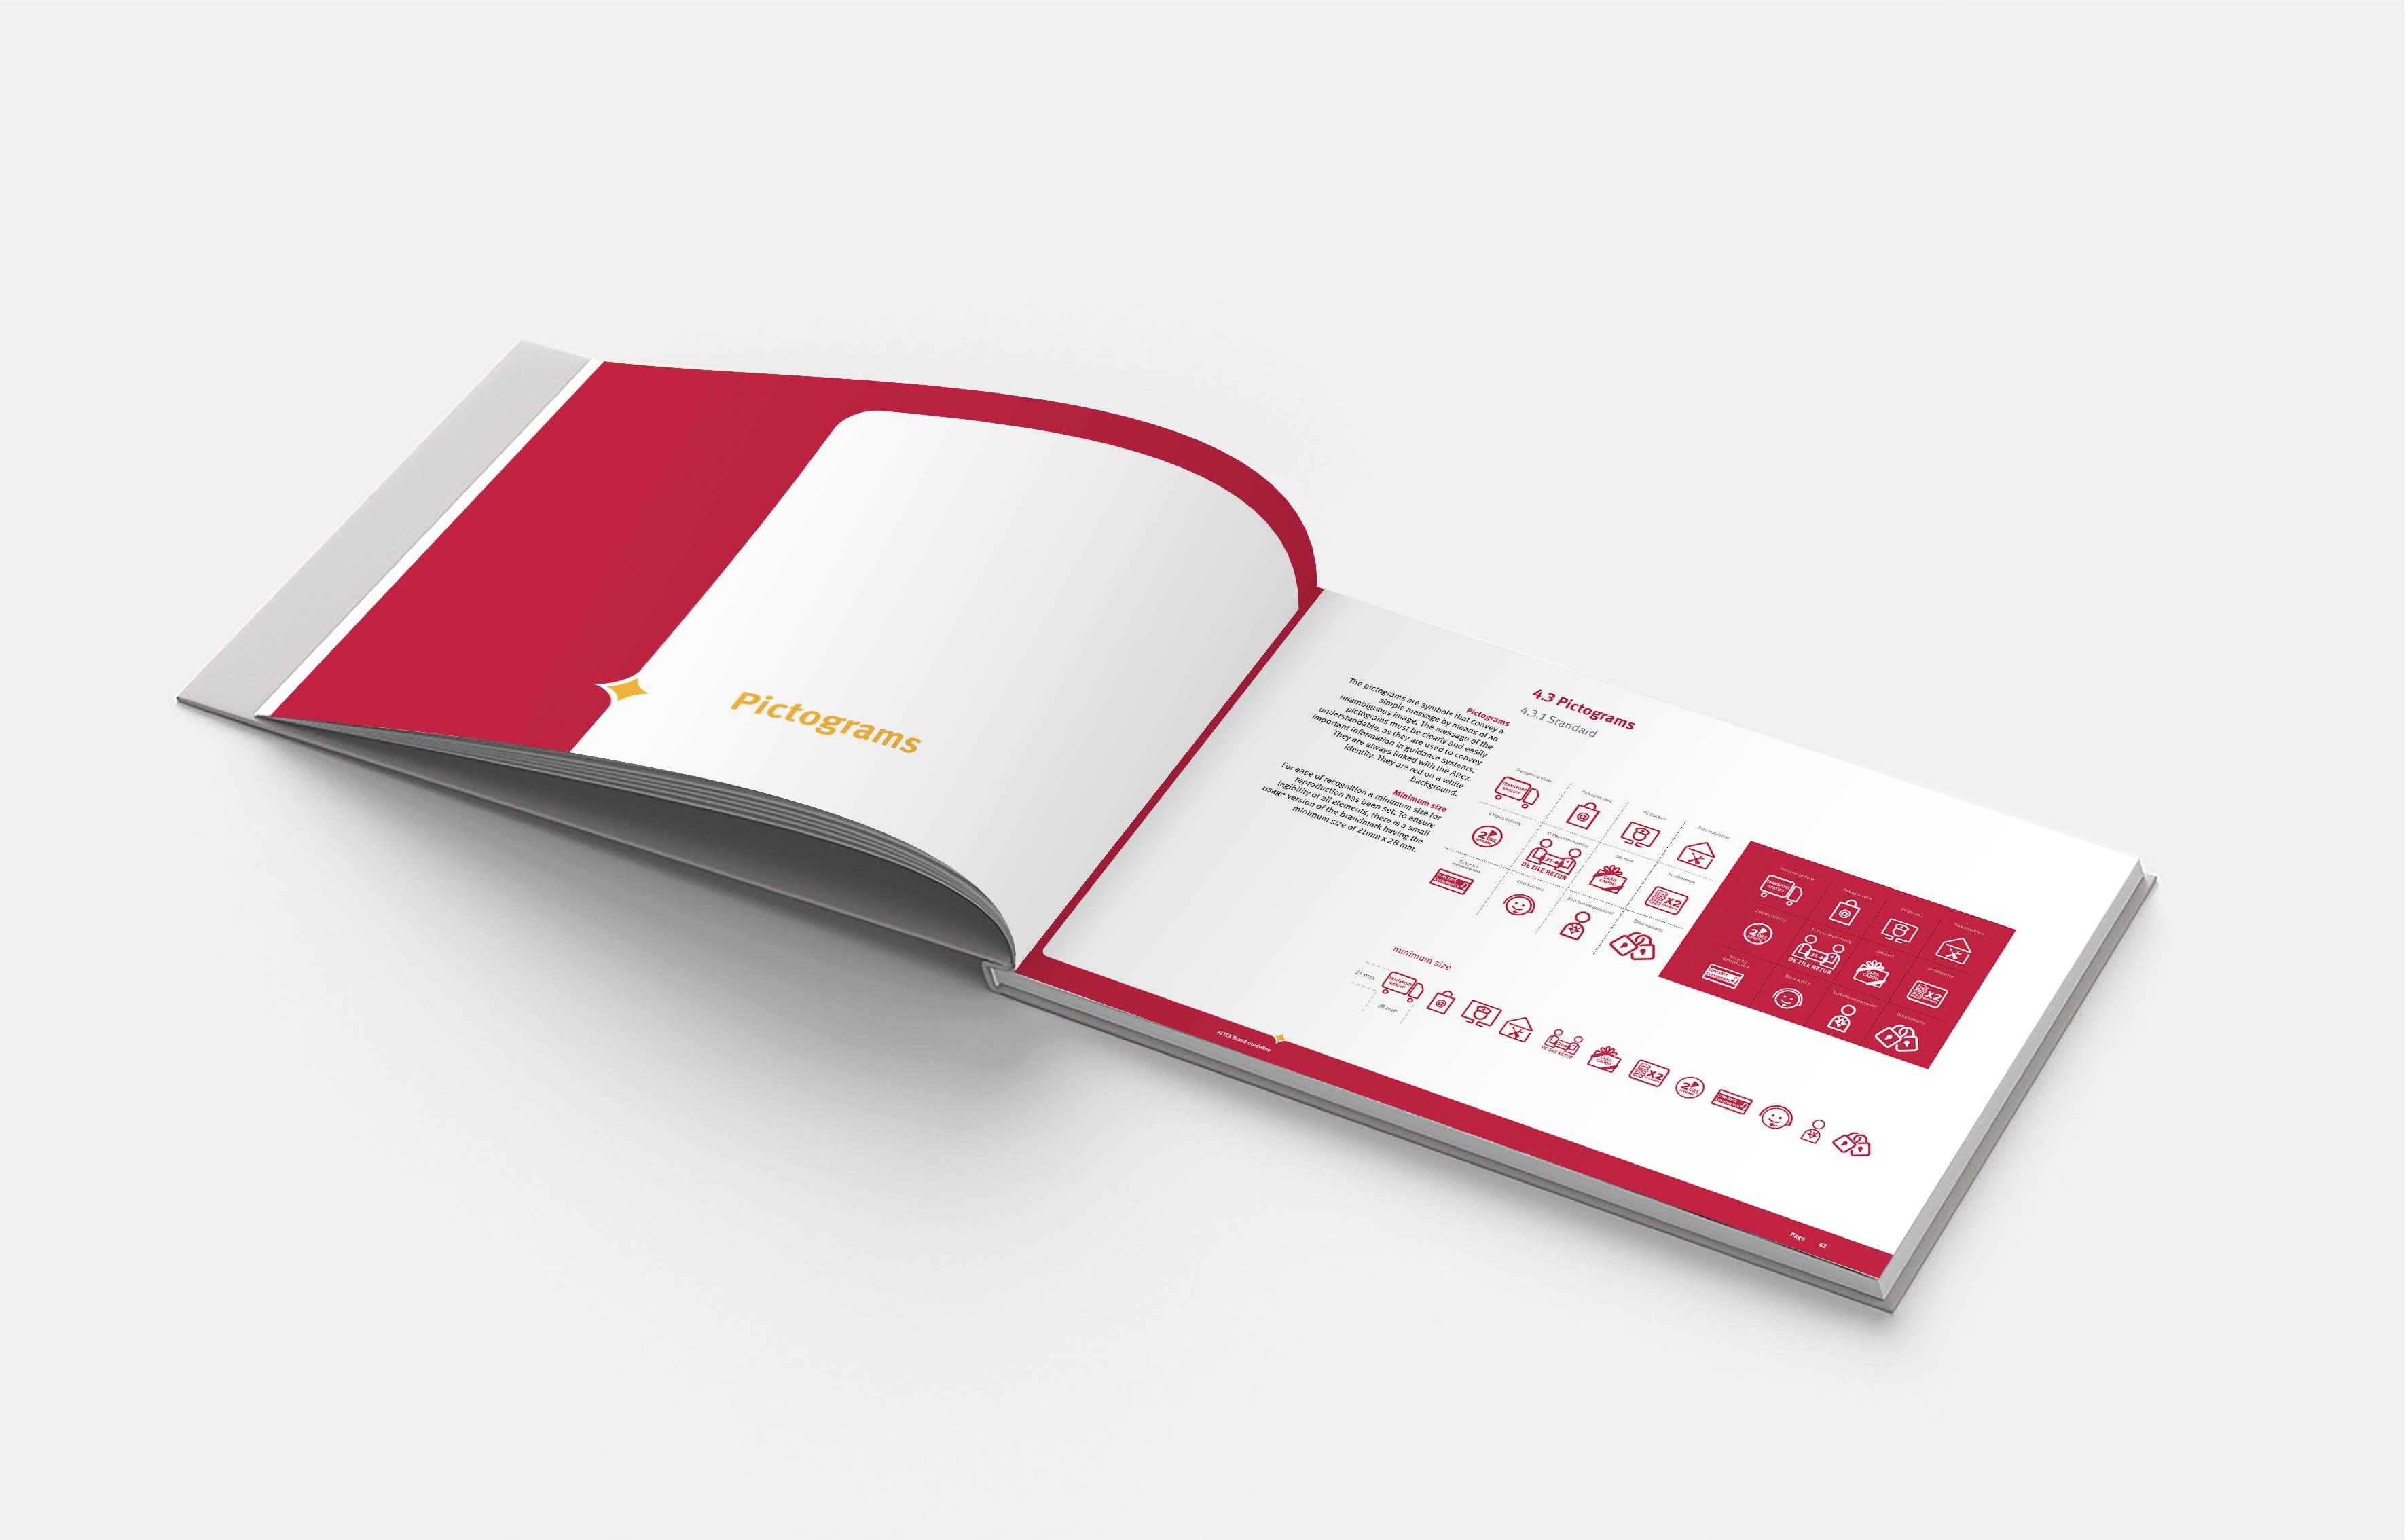 altex brandbook portofoliu inoveo